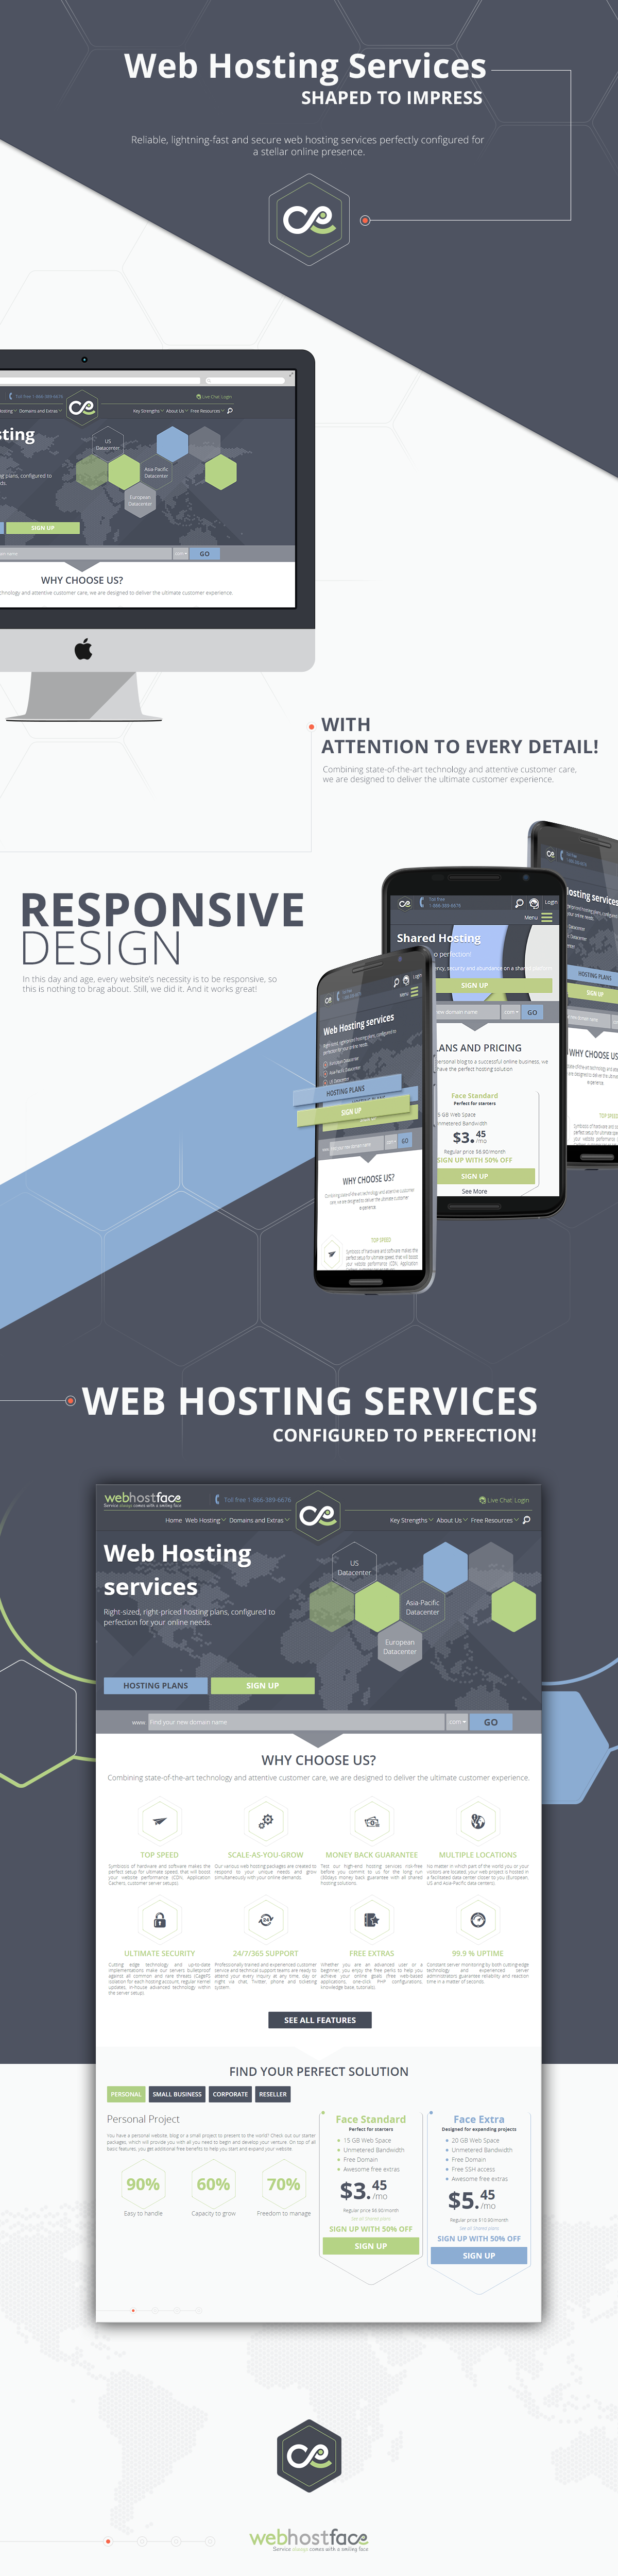 WebHostFace  new website